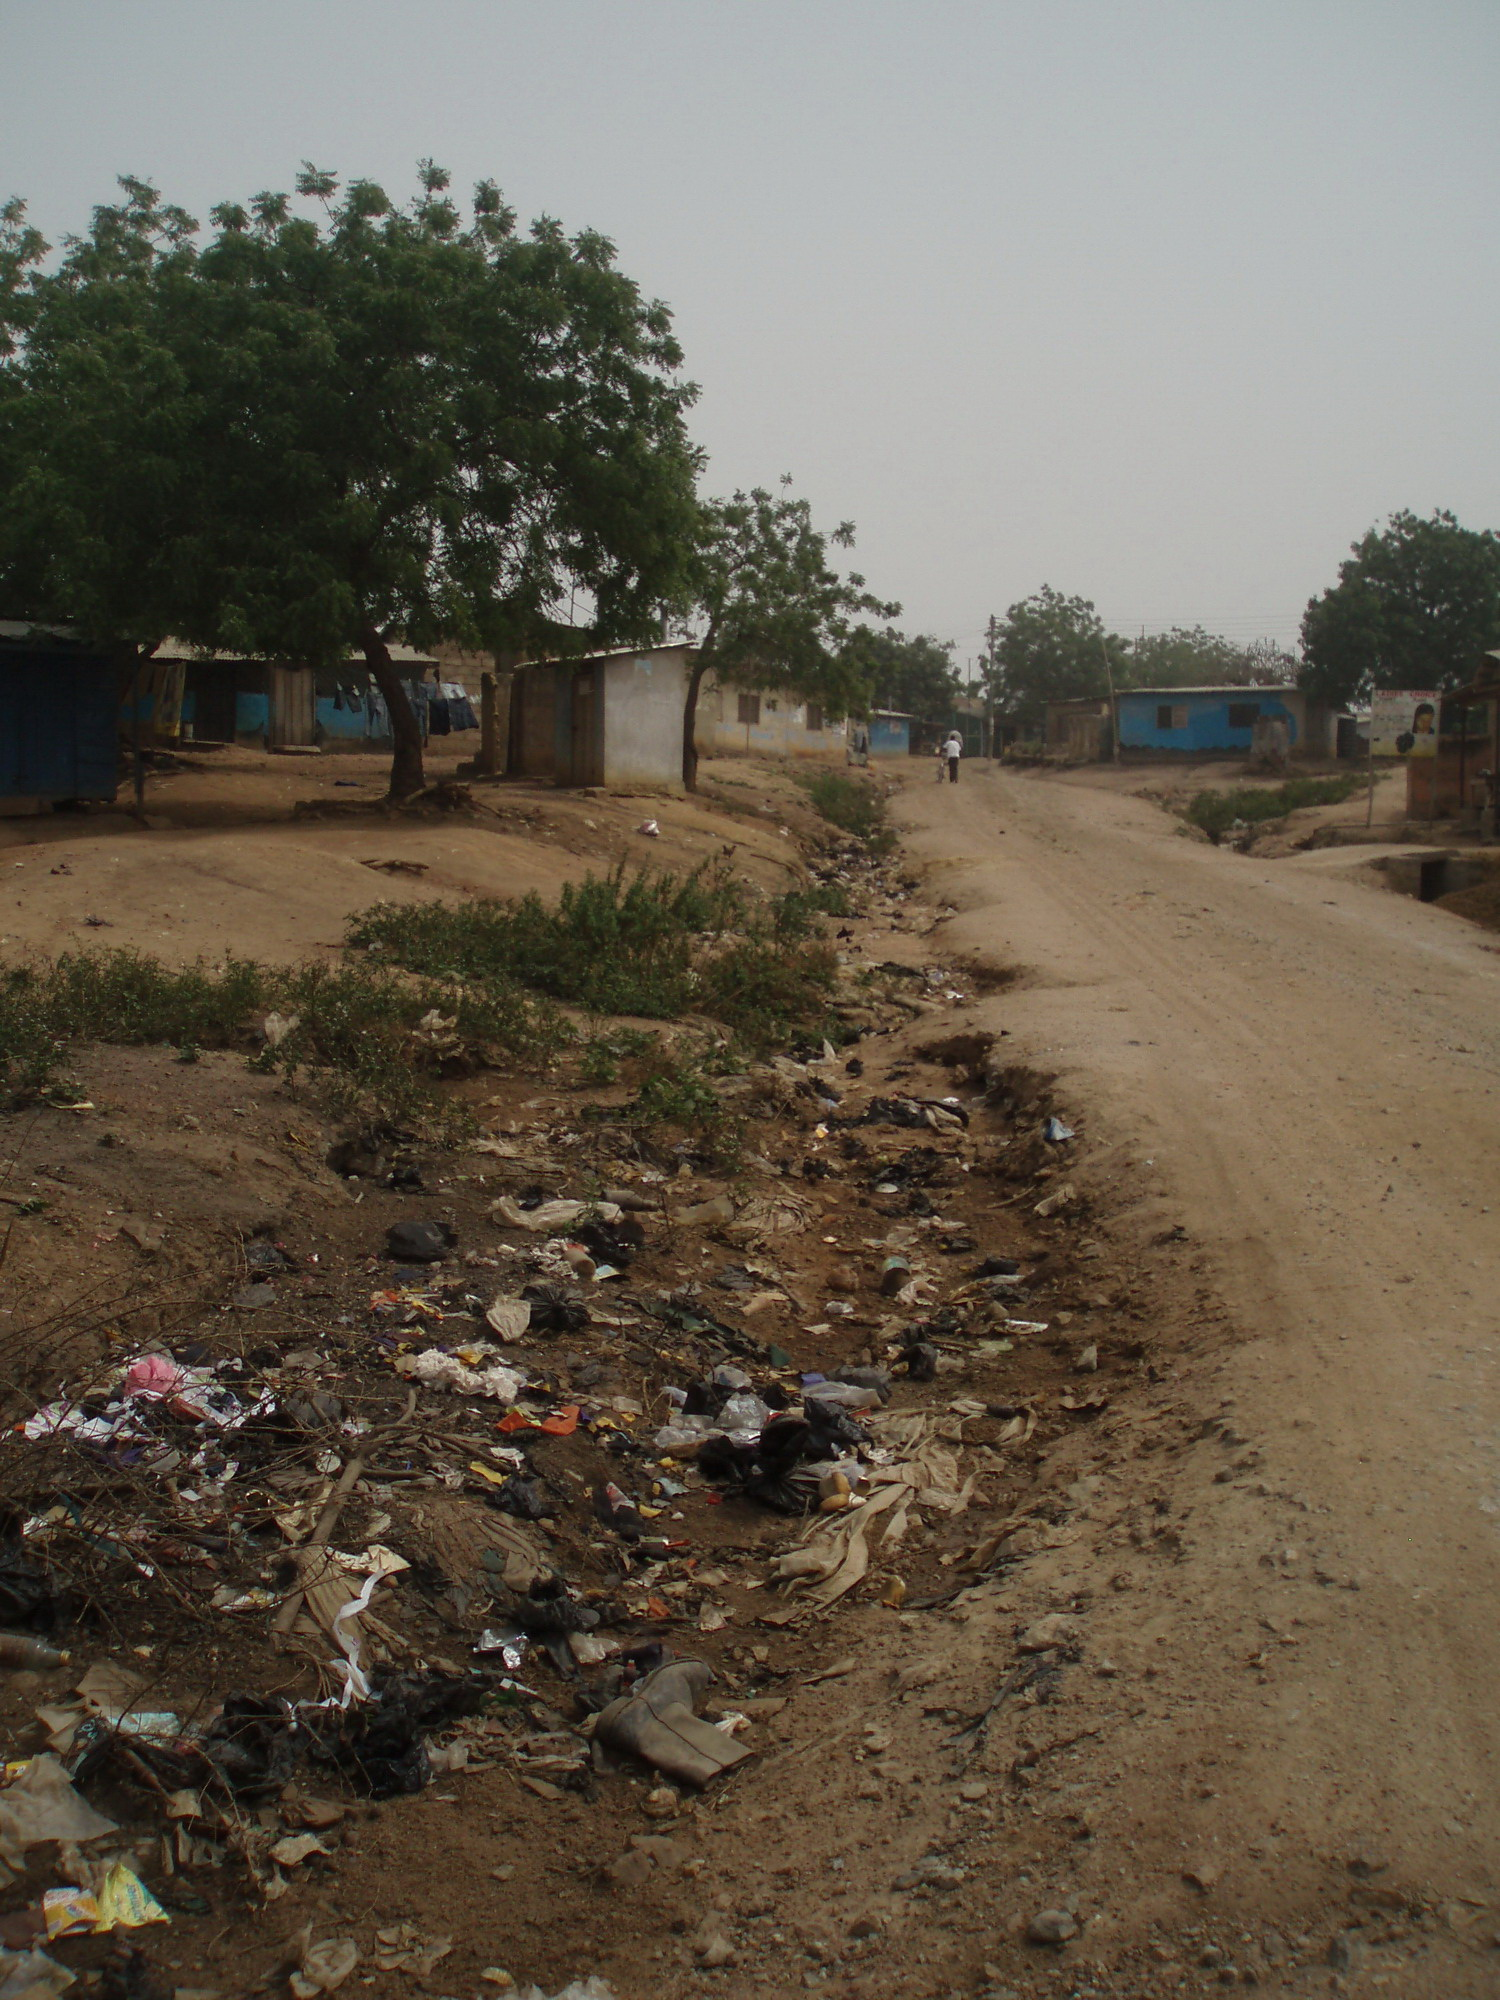 Buduburam Camp is deplorable!